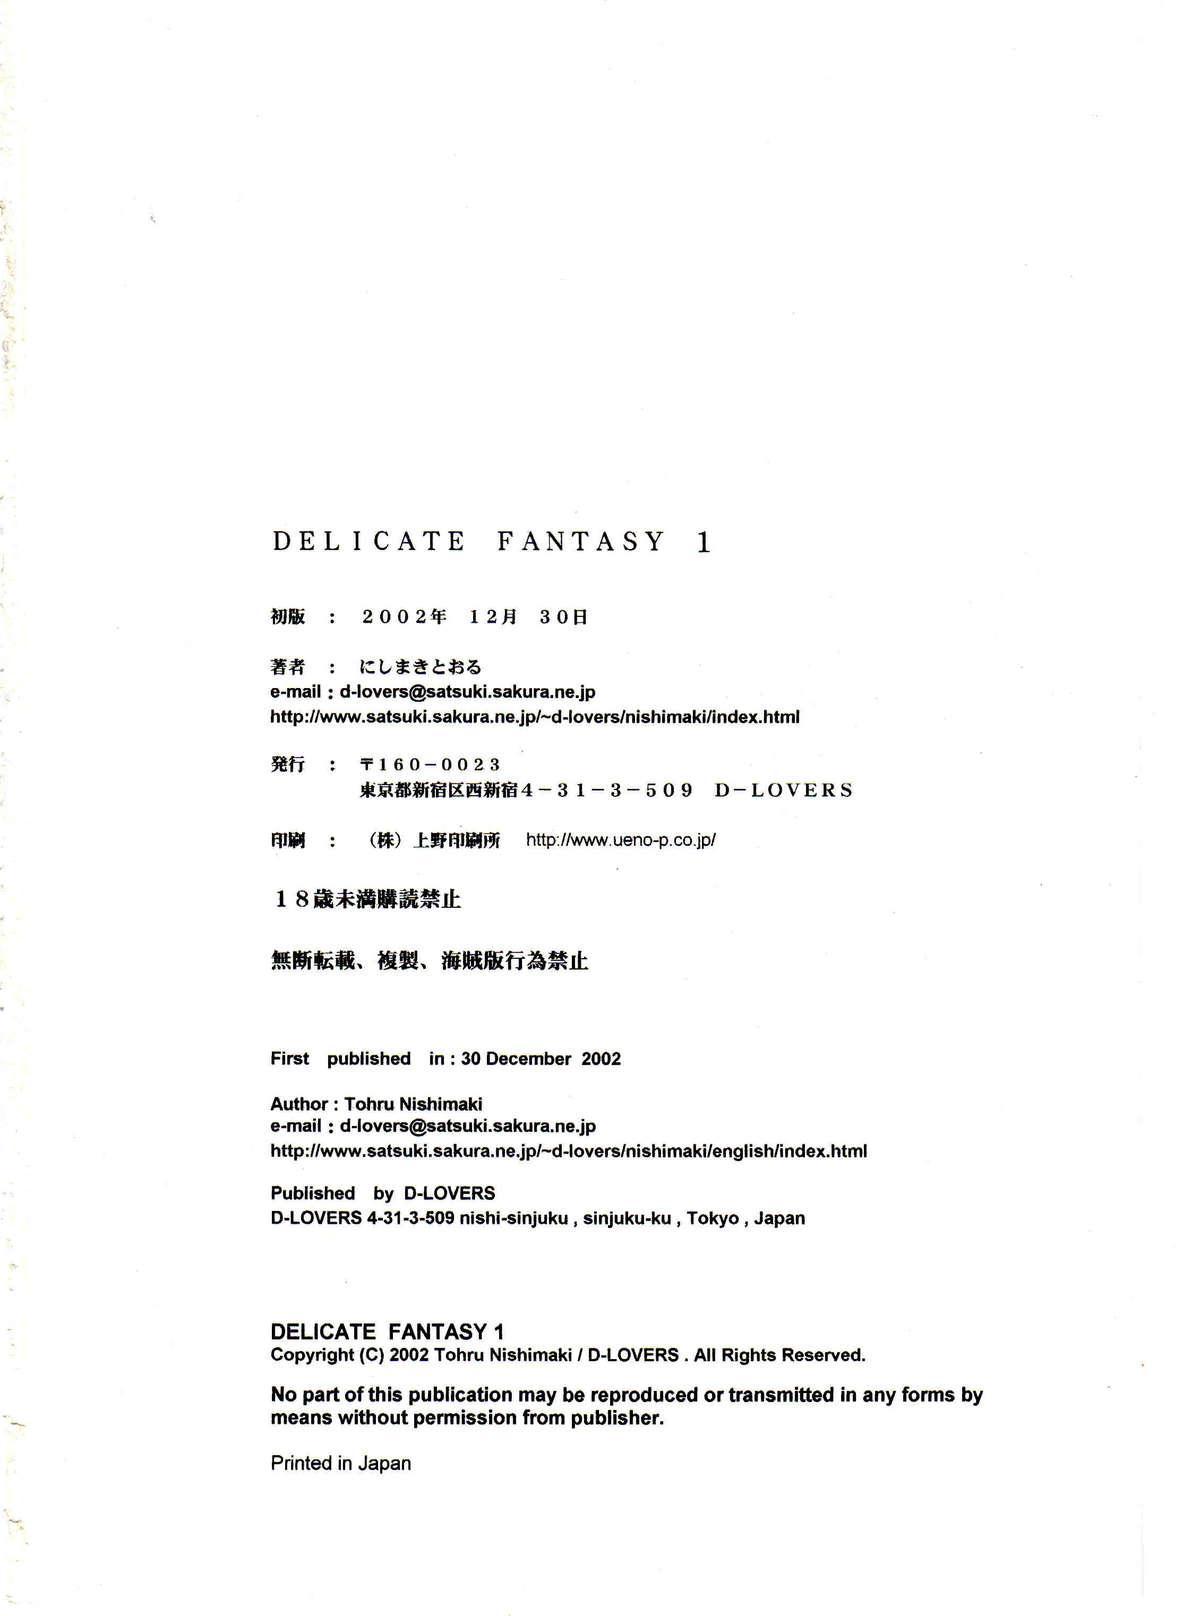 DELICATE FANTASY 1 42